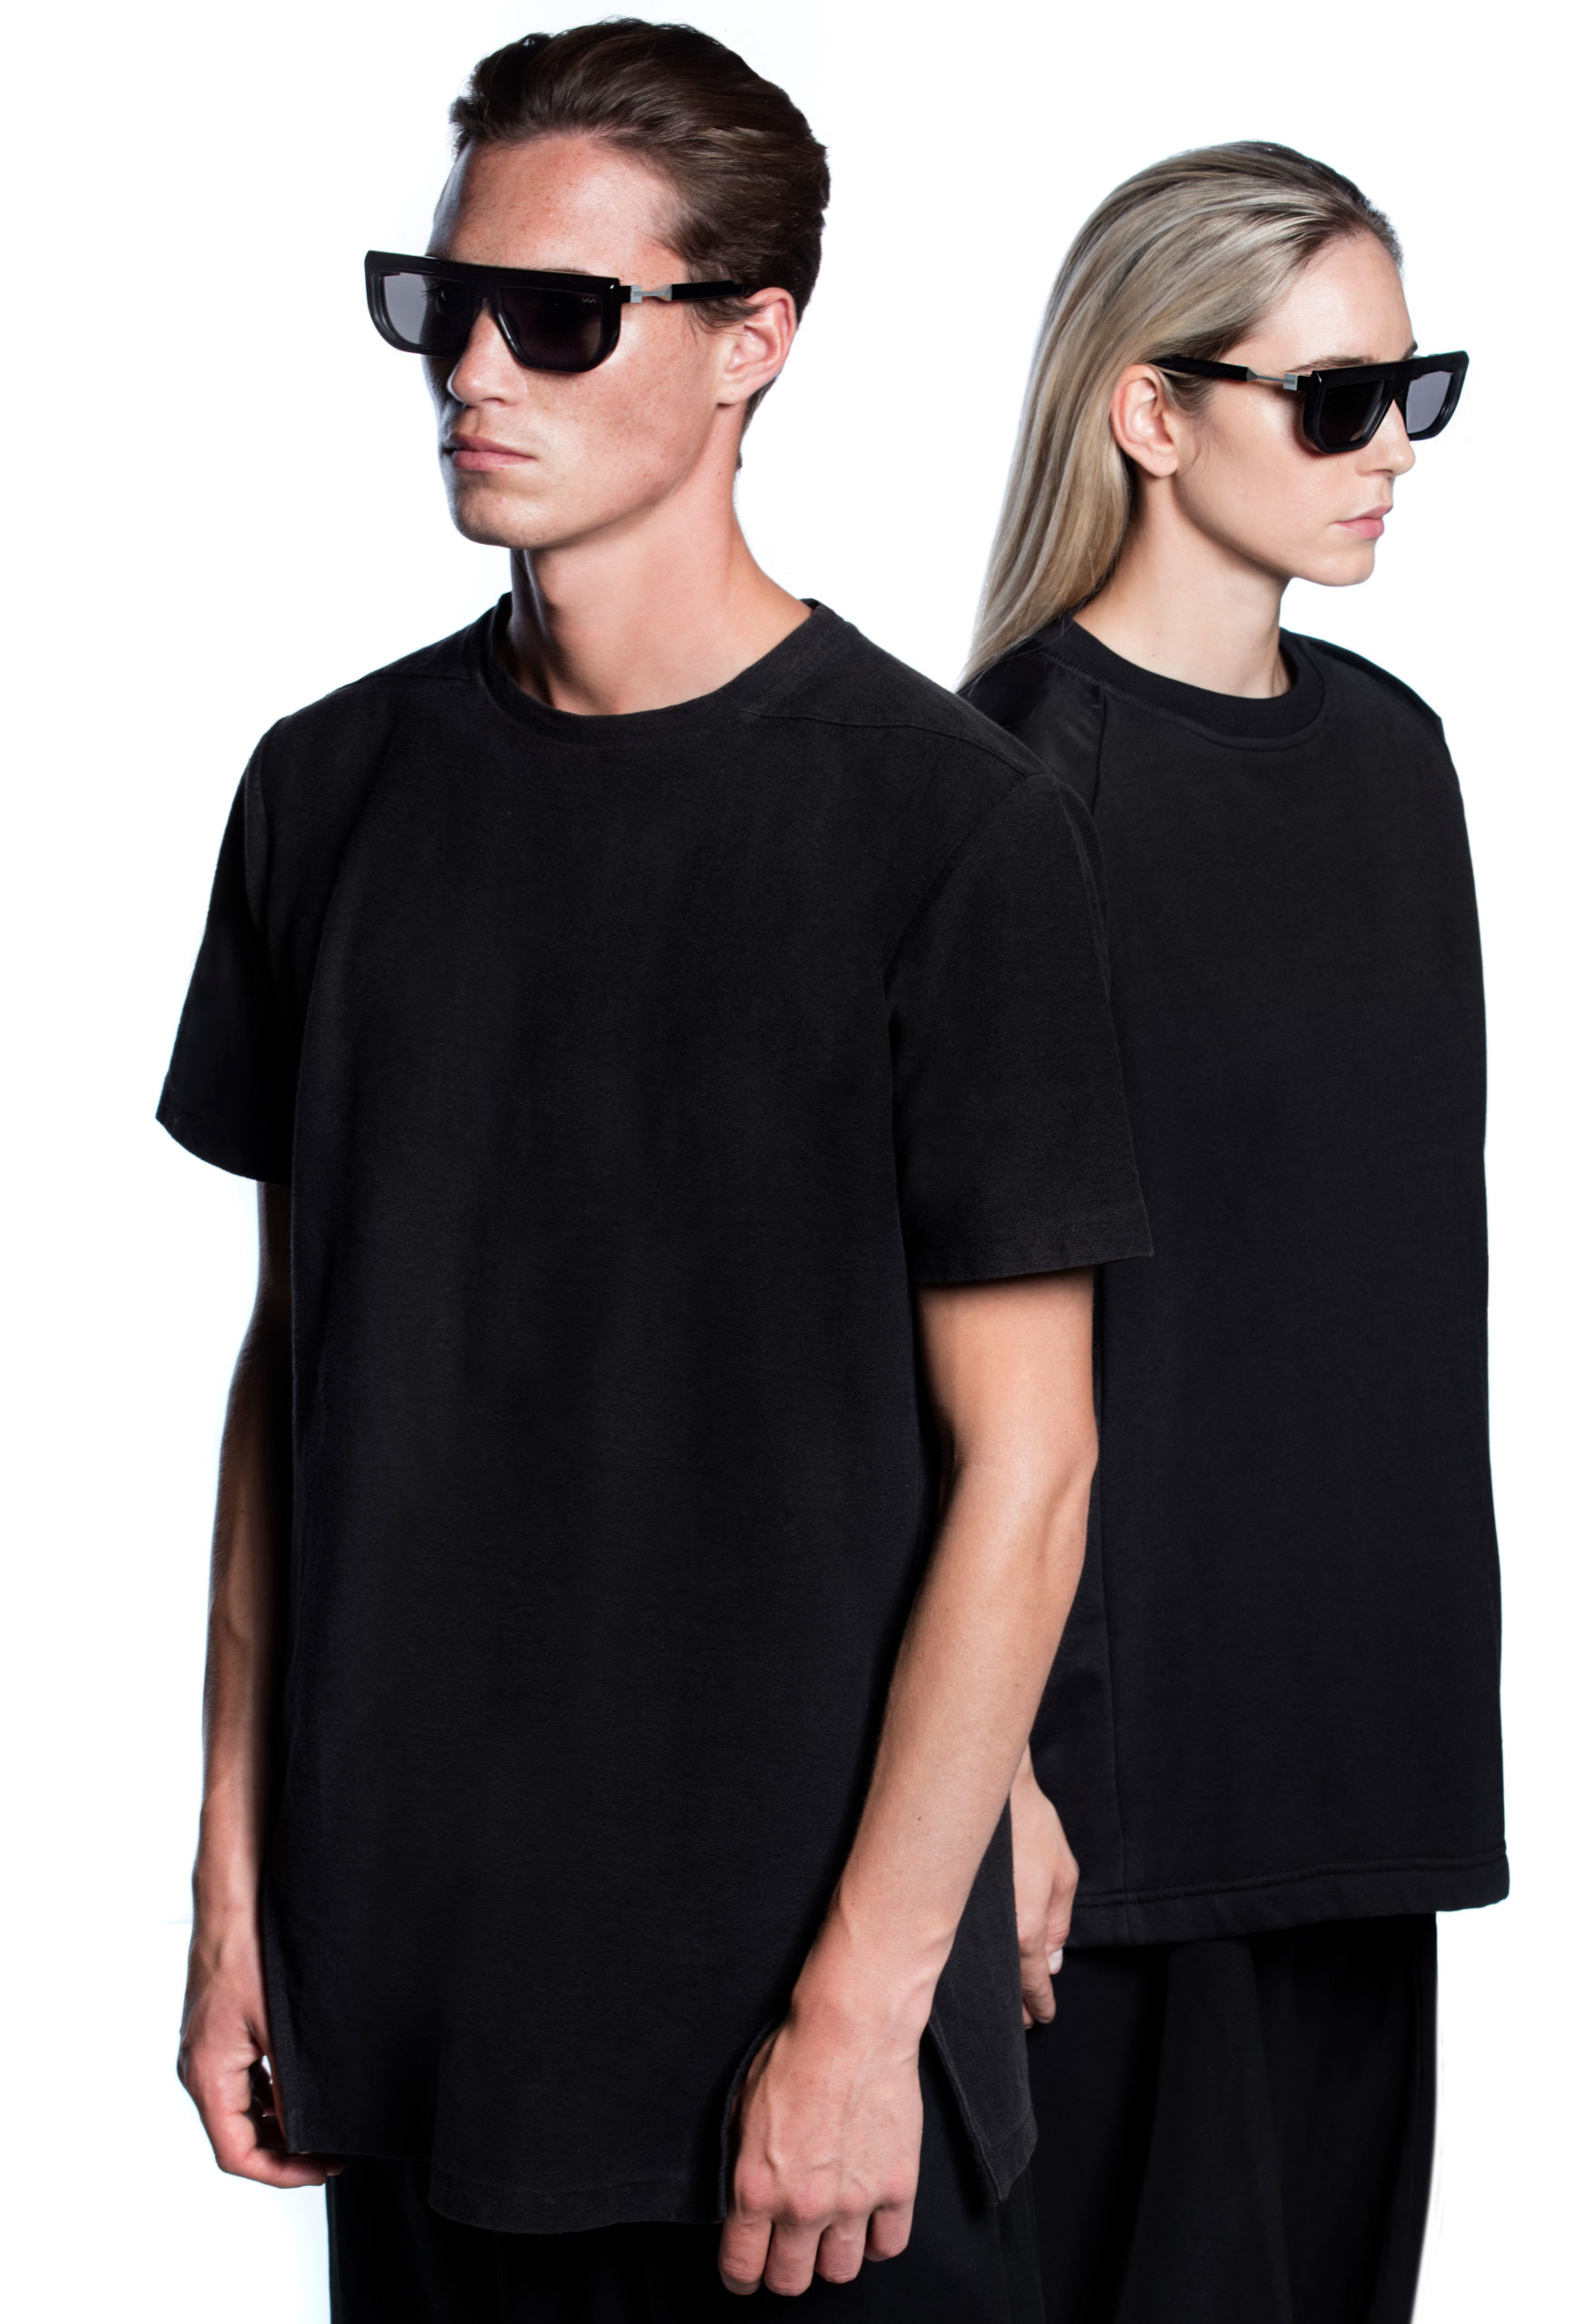 vava bl0020 black shop online eyewear